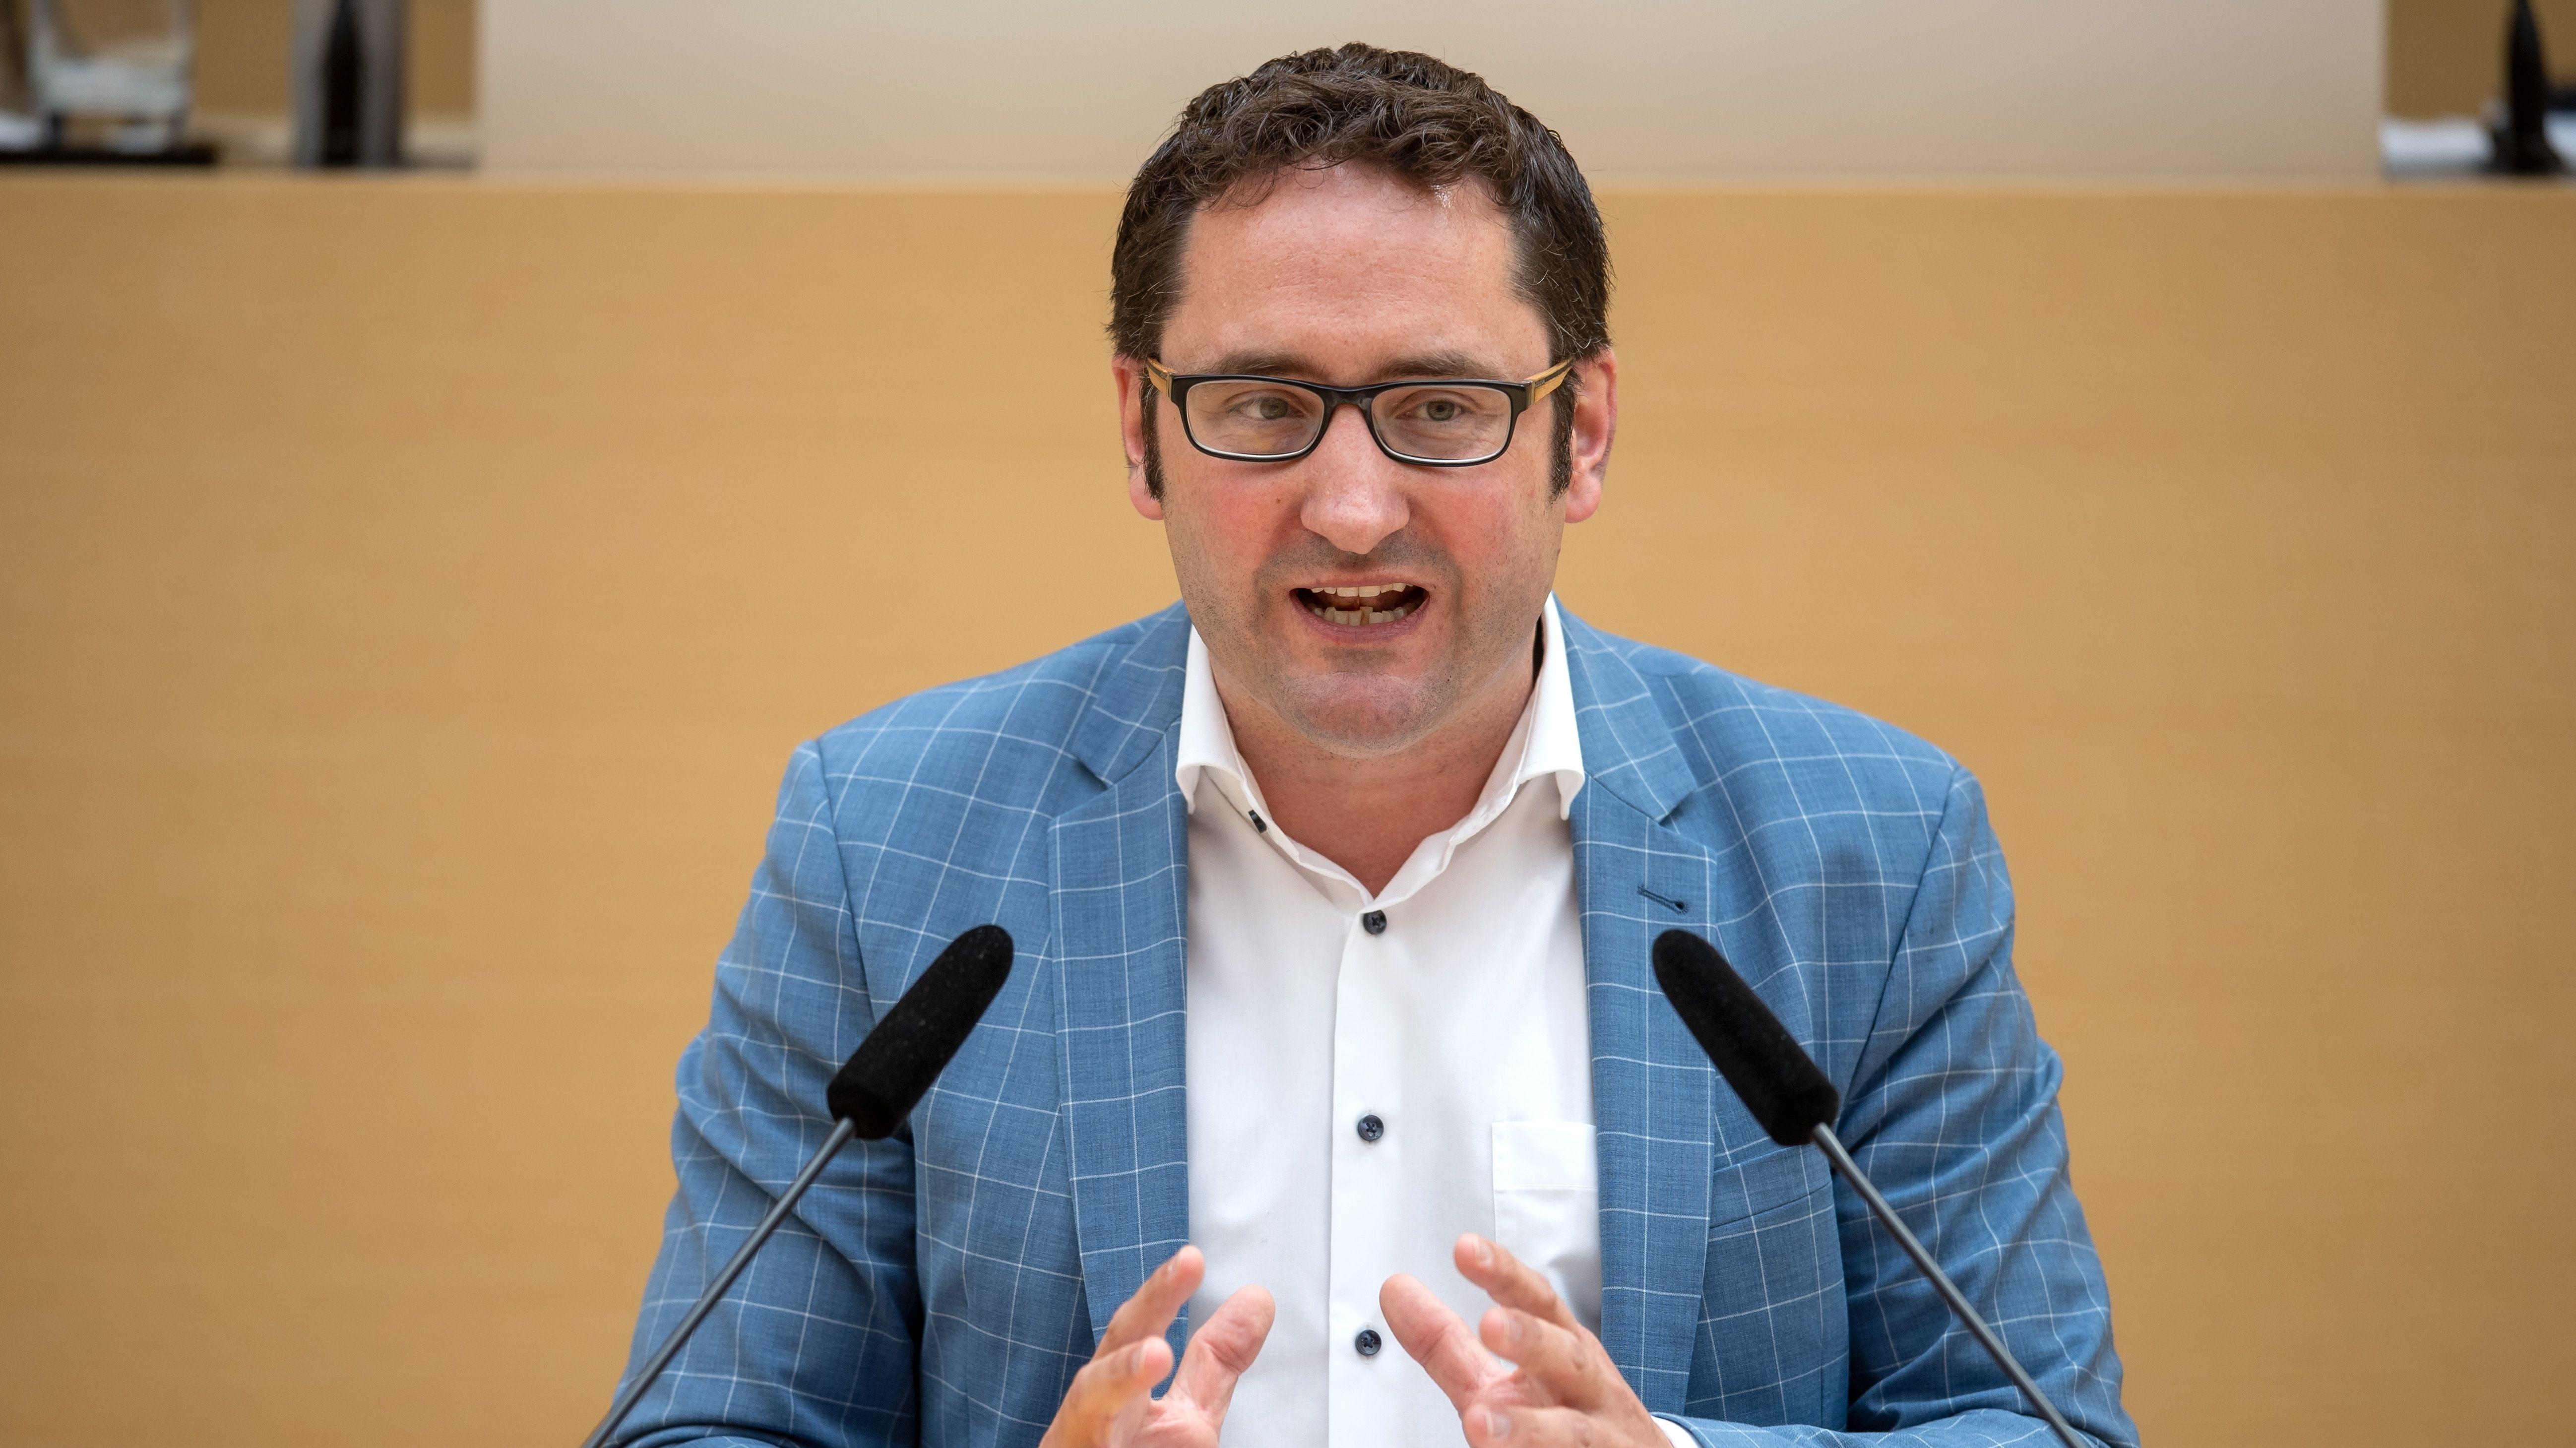 Tobias Gotthardt (Freie Wähler)